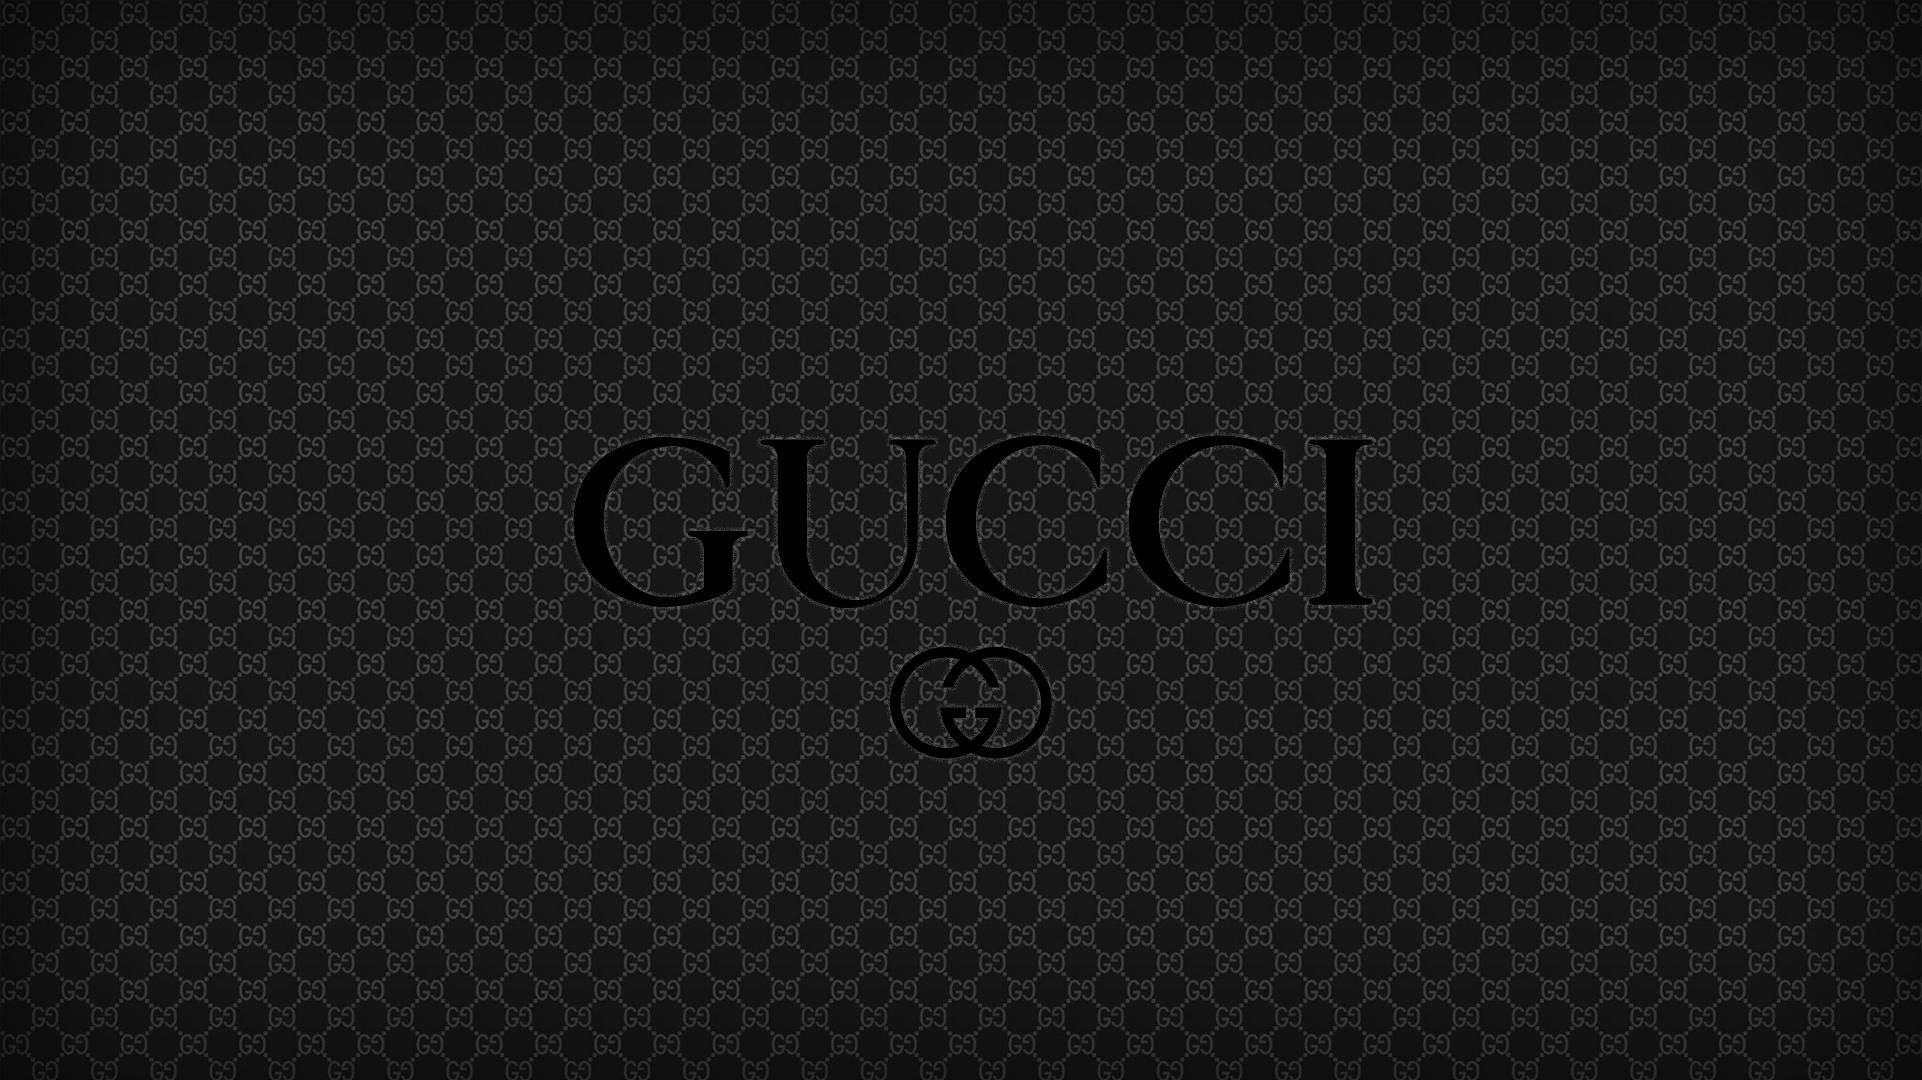 Gucci Logo Wallpapers Wallpaper Cave Стиль, Картинки